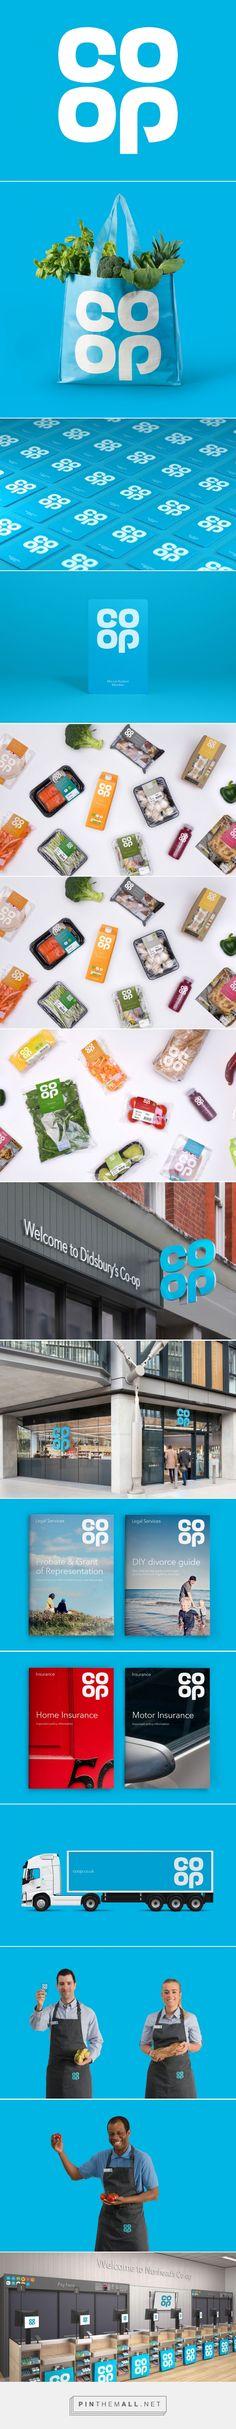 El marca británica CO-OP recupera su antiguo logo de 1968 | Brandemia_... - a grouped images picture - Pin Them All